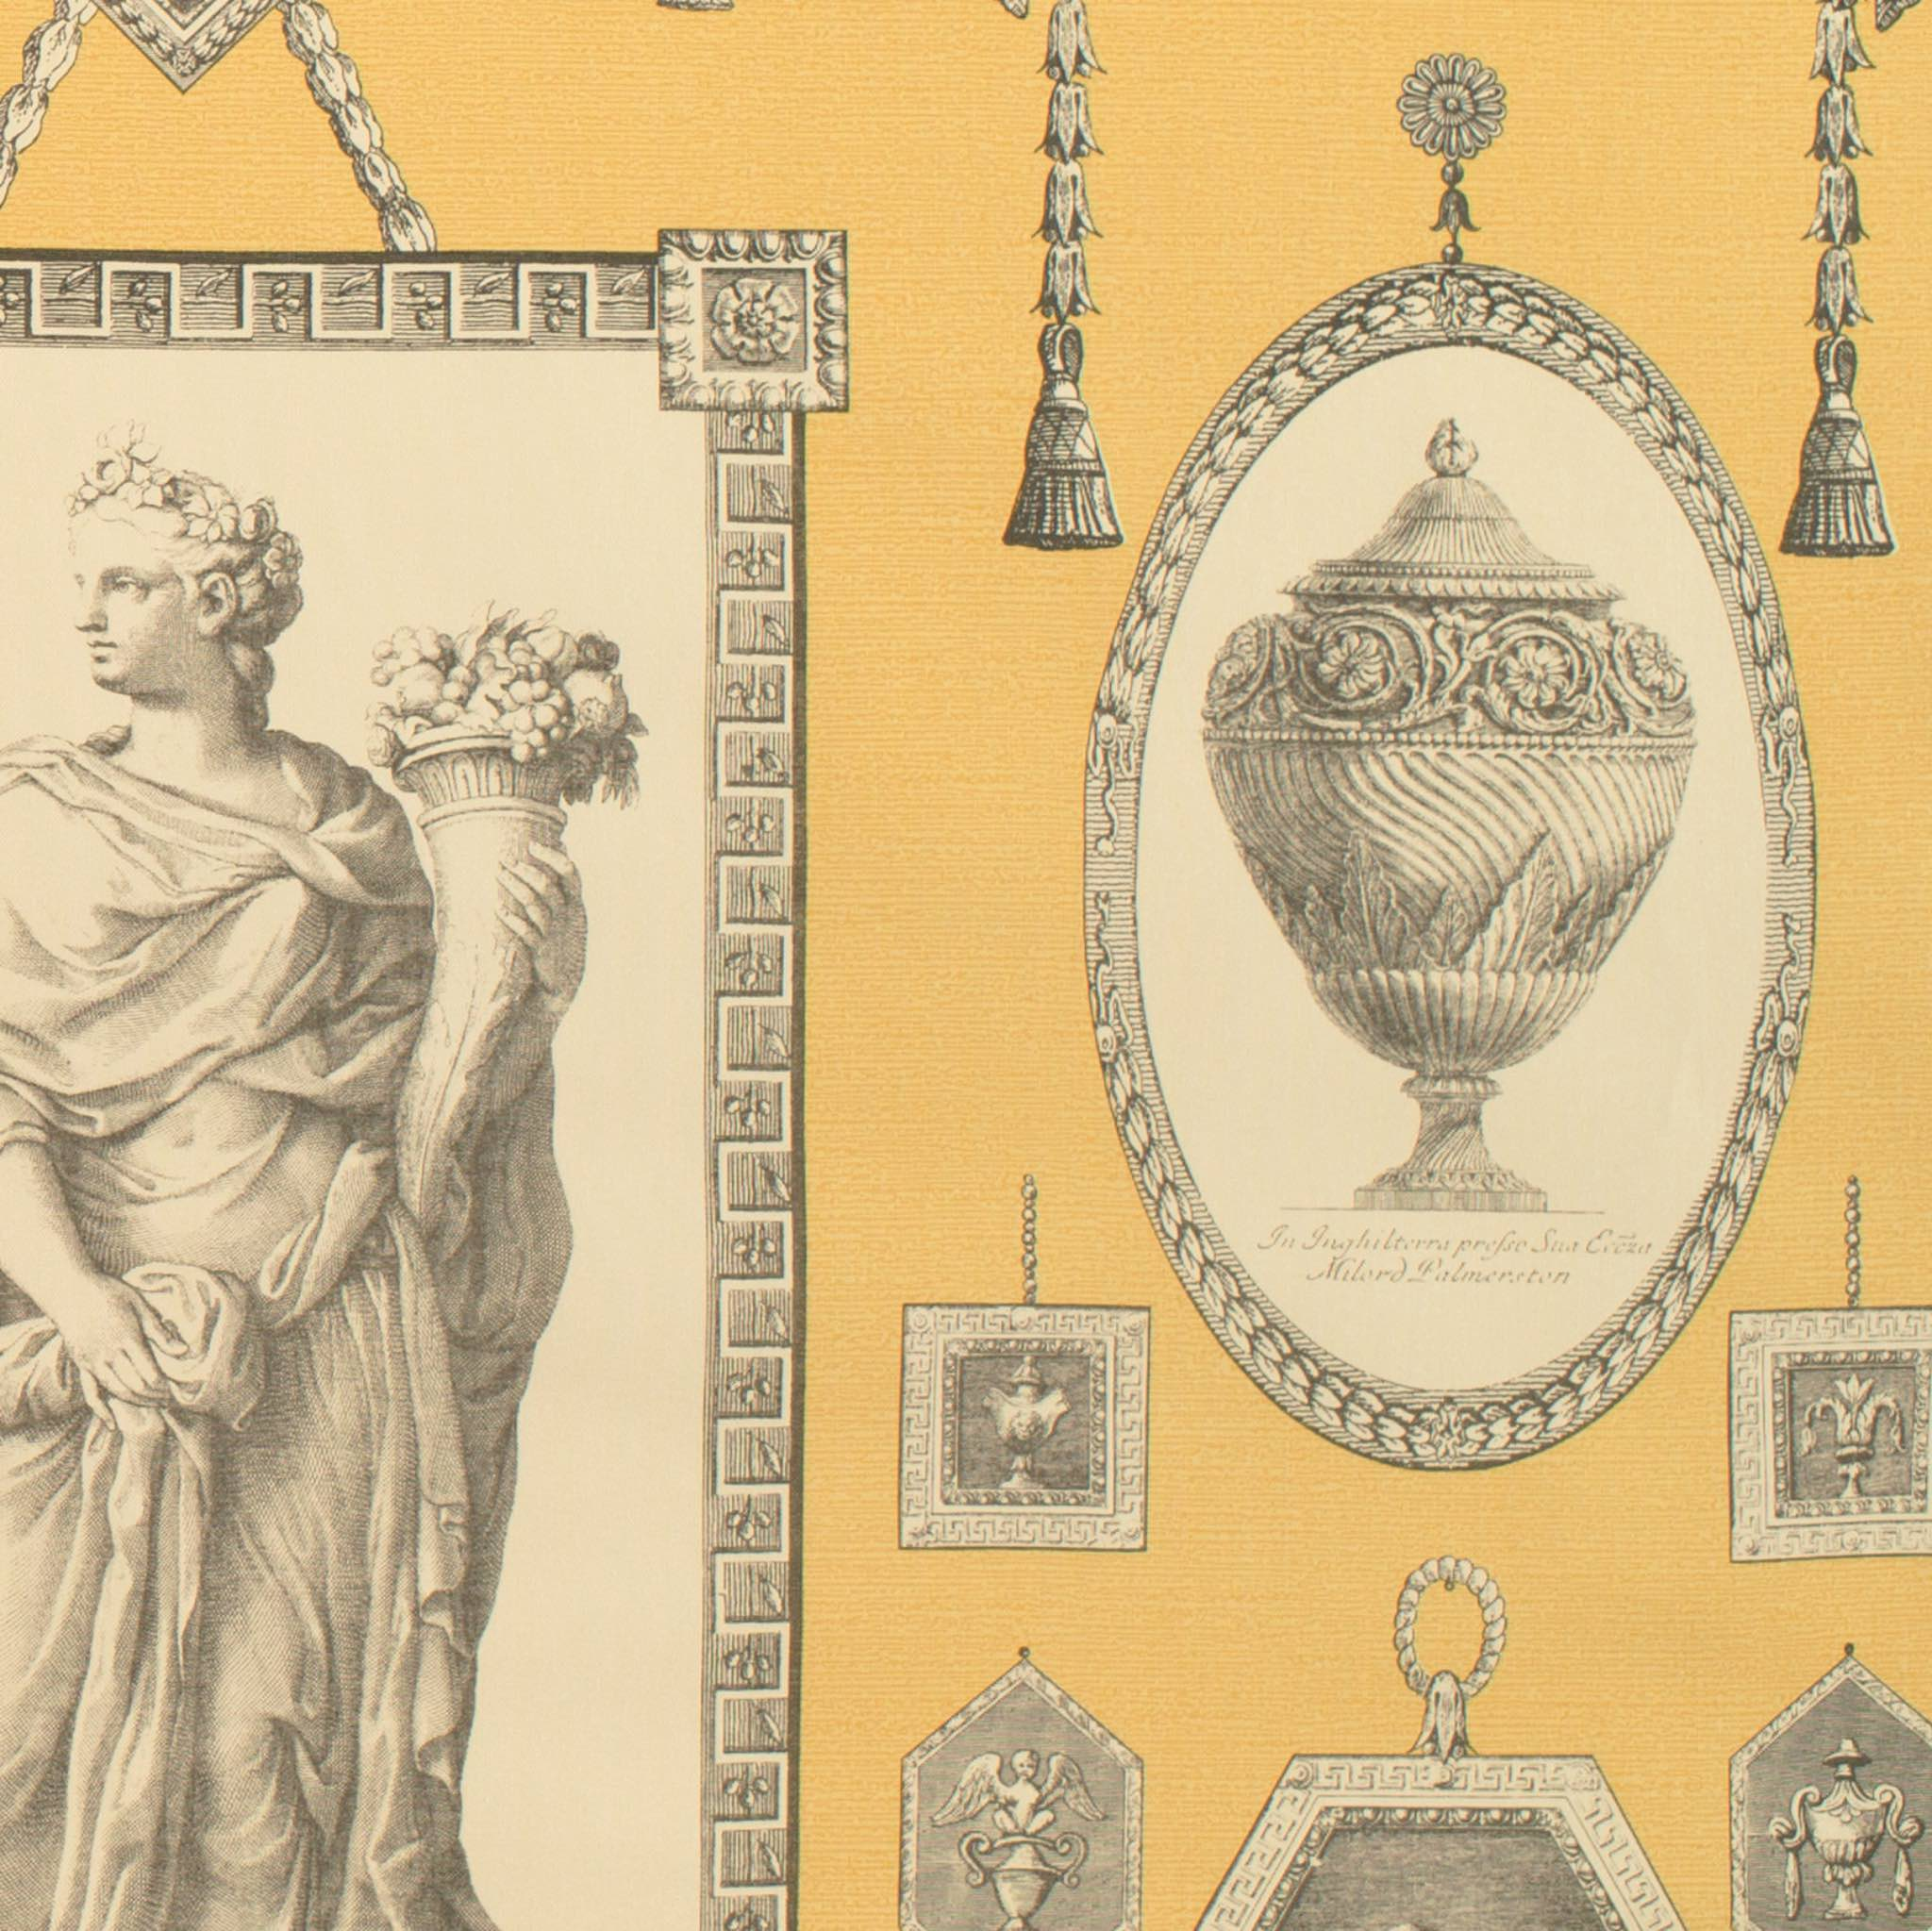 Nile&York_Archive Prints_Classical Garden_AP21906_Yellow_swatch_1x1_2.5MB.jpg